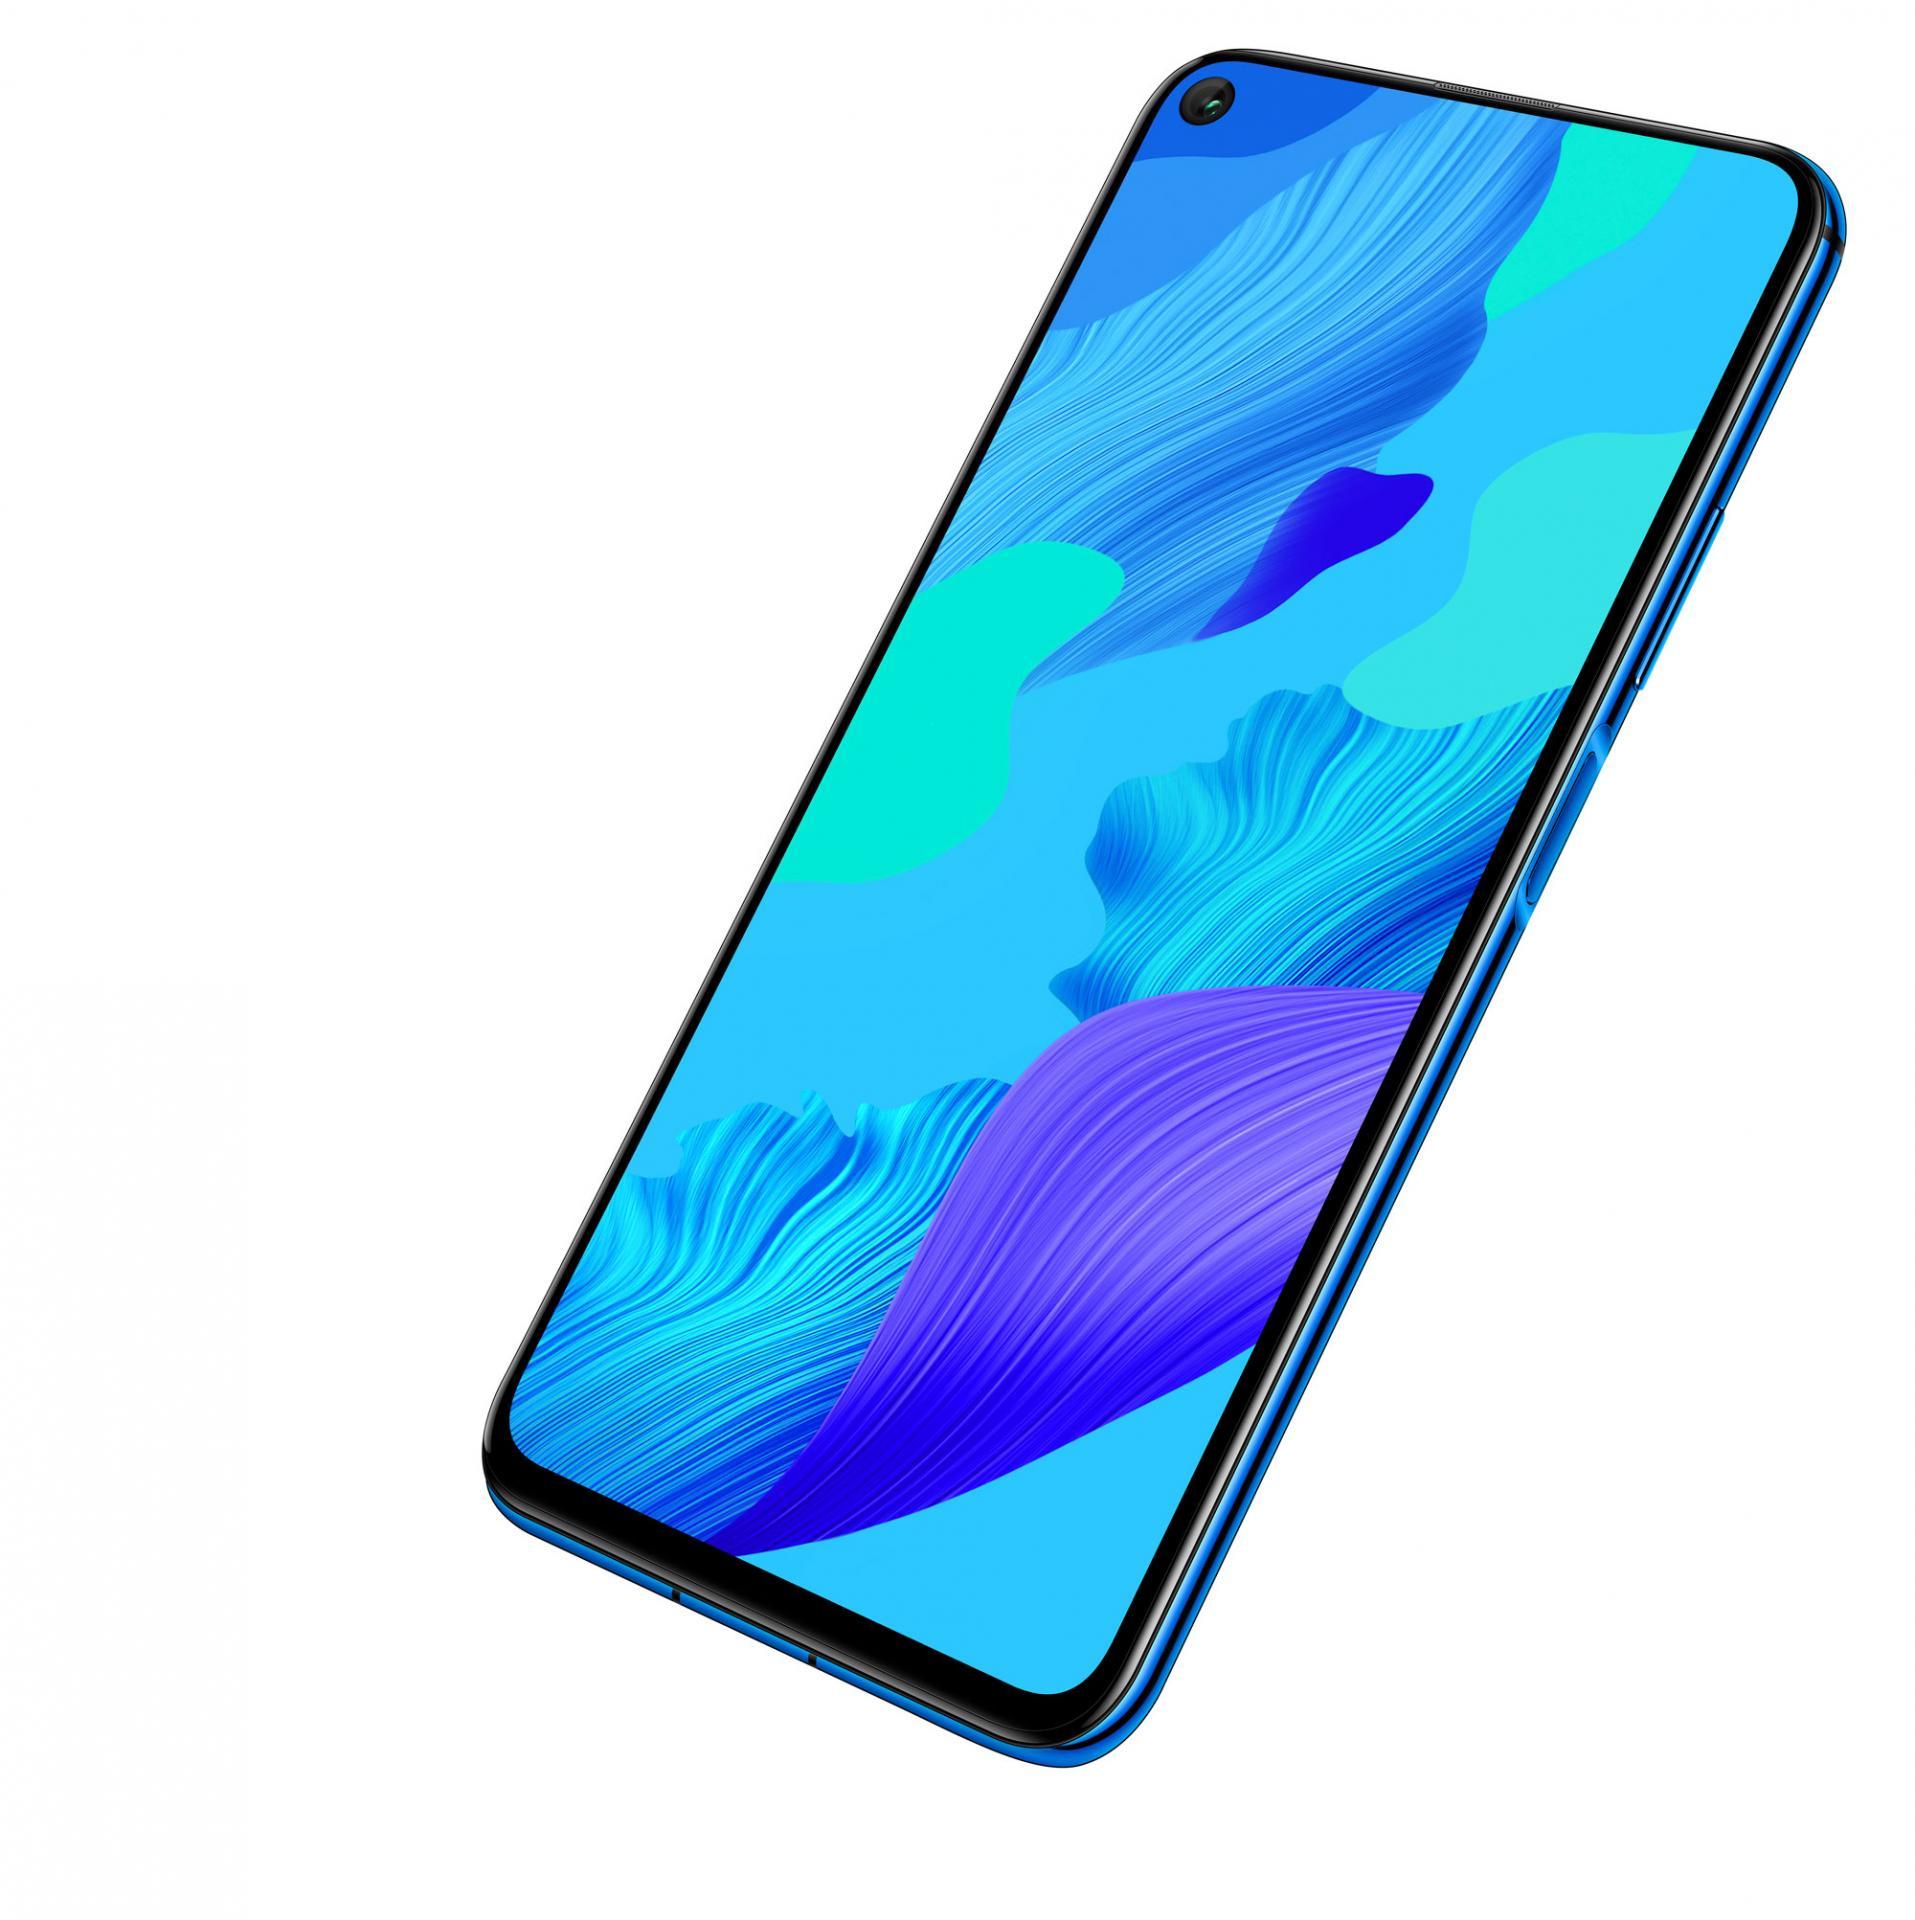 Смартфон с4 объективами основной камеры Huawei Nova 5T. Почти впродаже